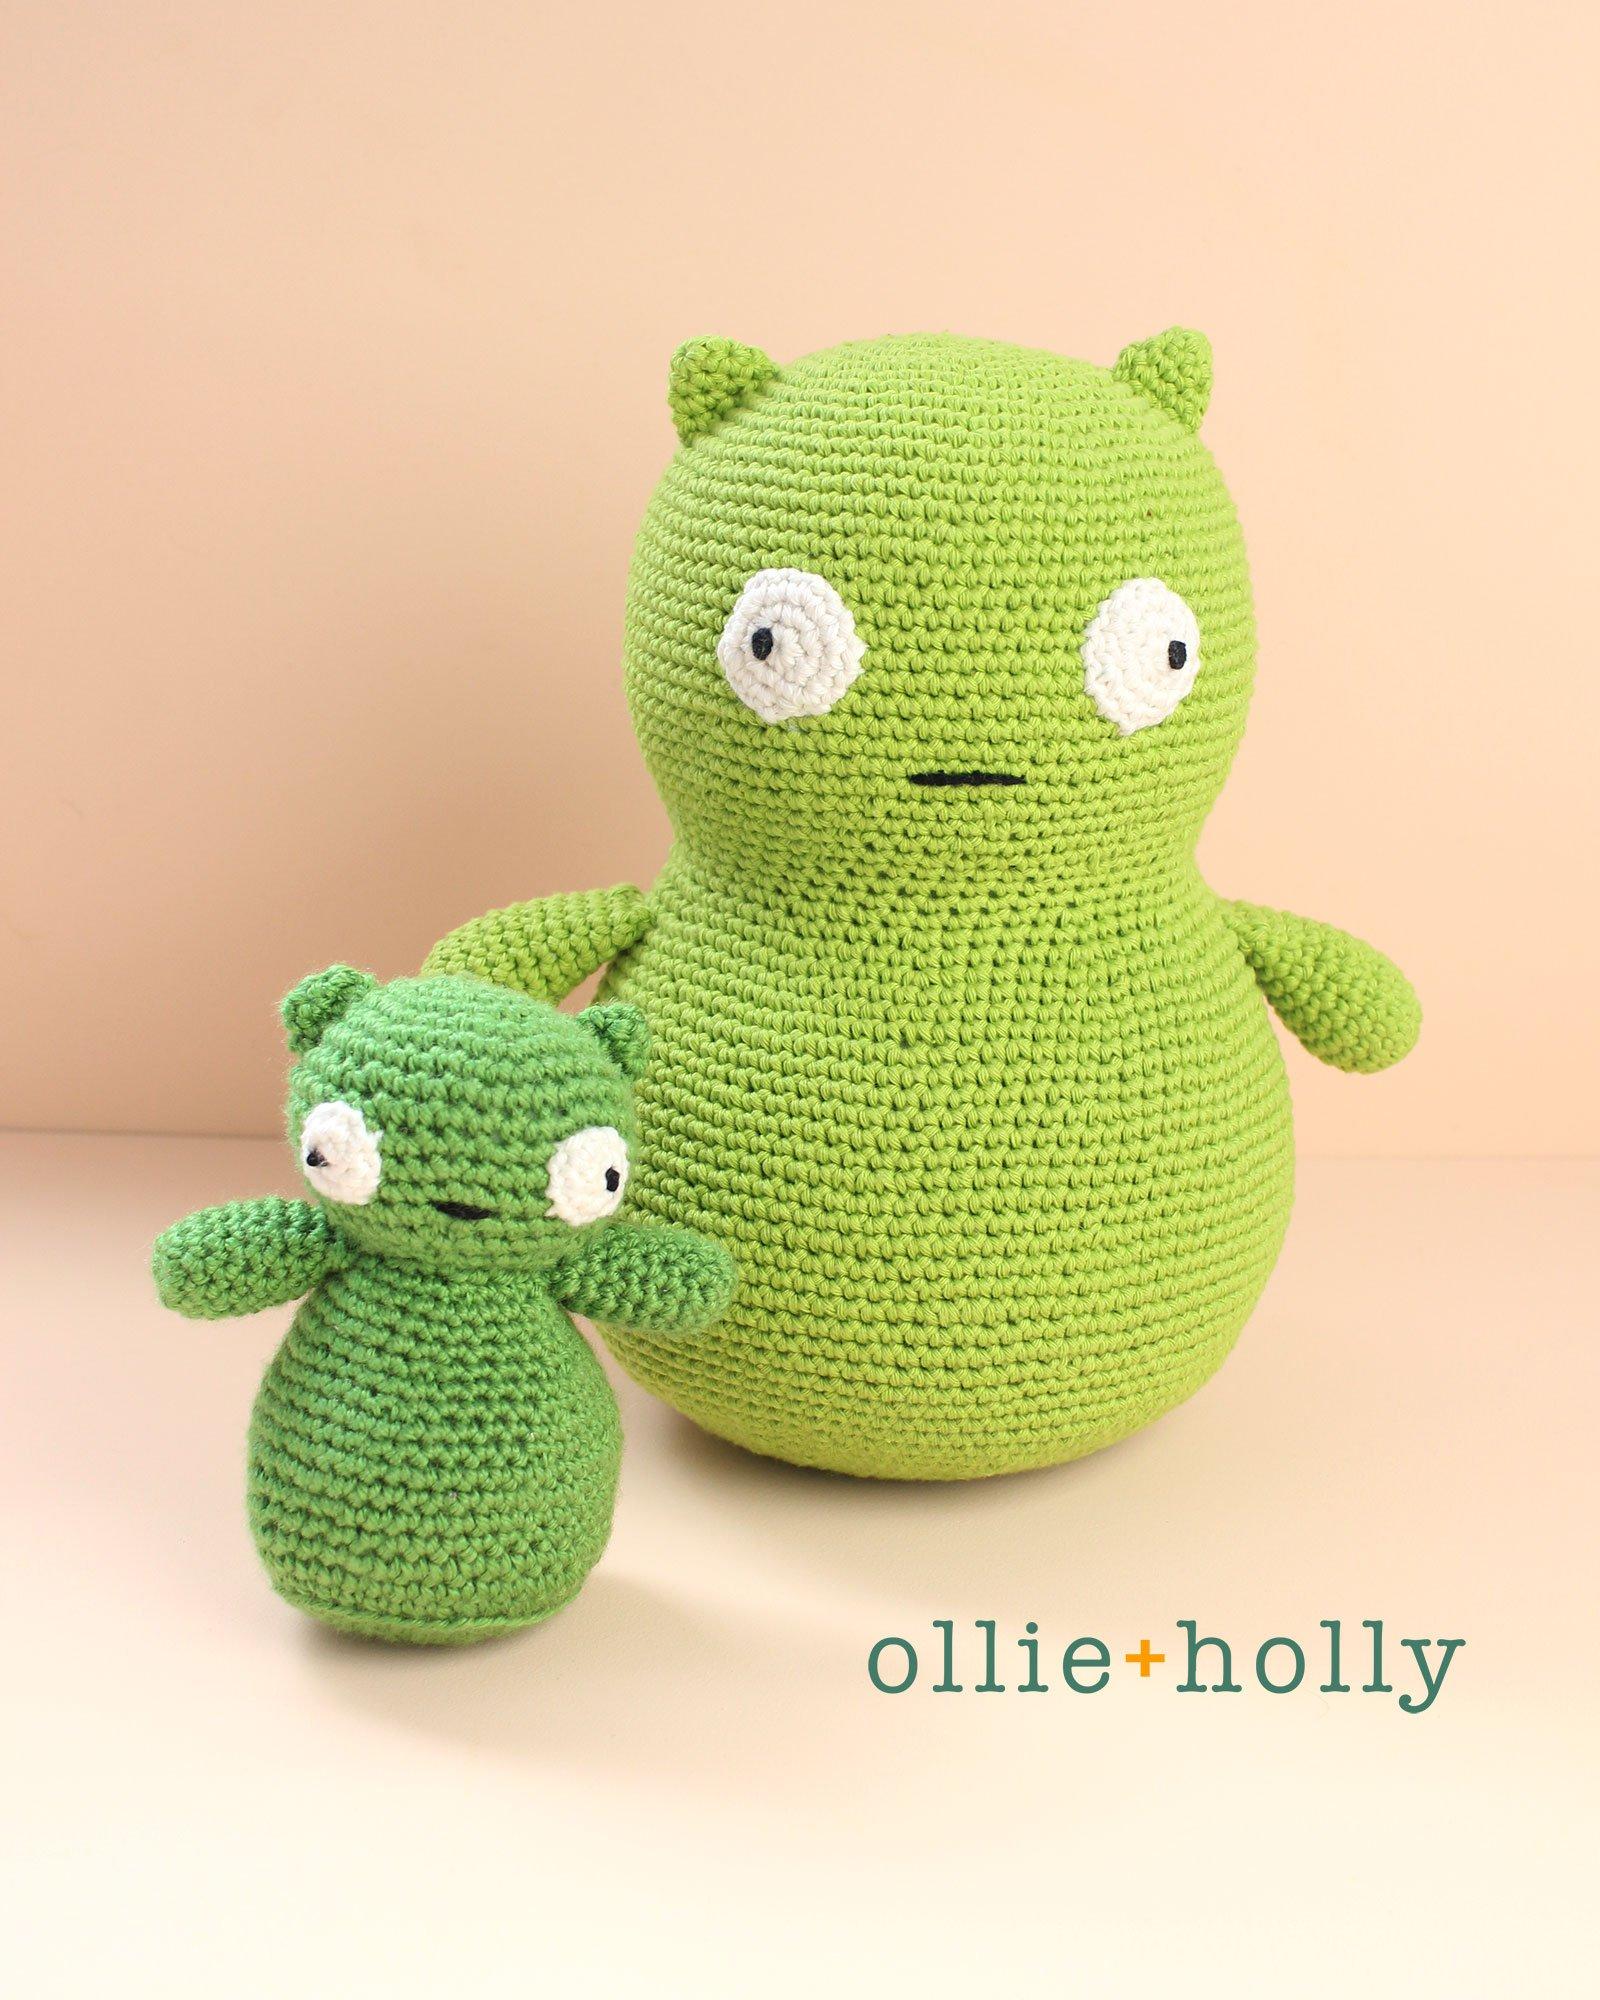 Free Louise Belcher's Stuffed Animal Kuchi Kopi (from Bob's Burgers) Amigurumi Crochet Pattern